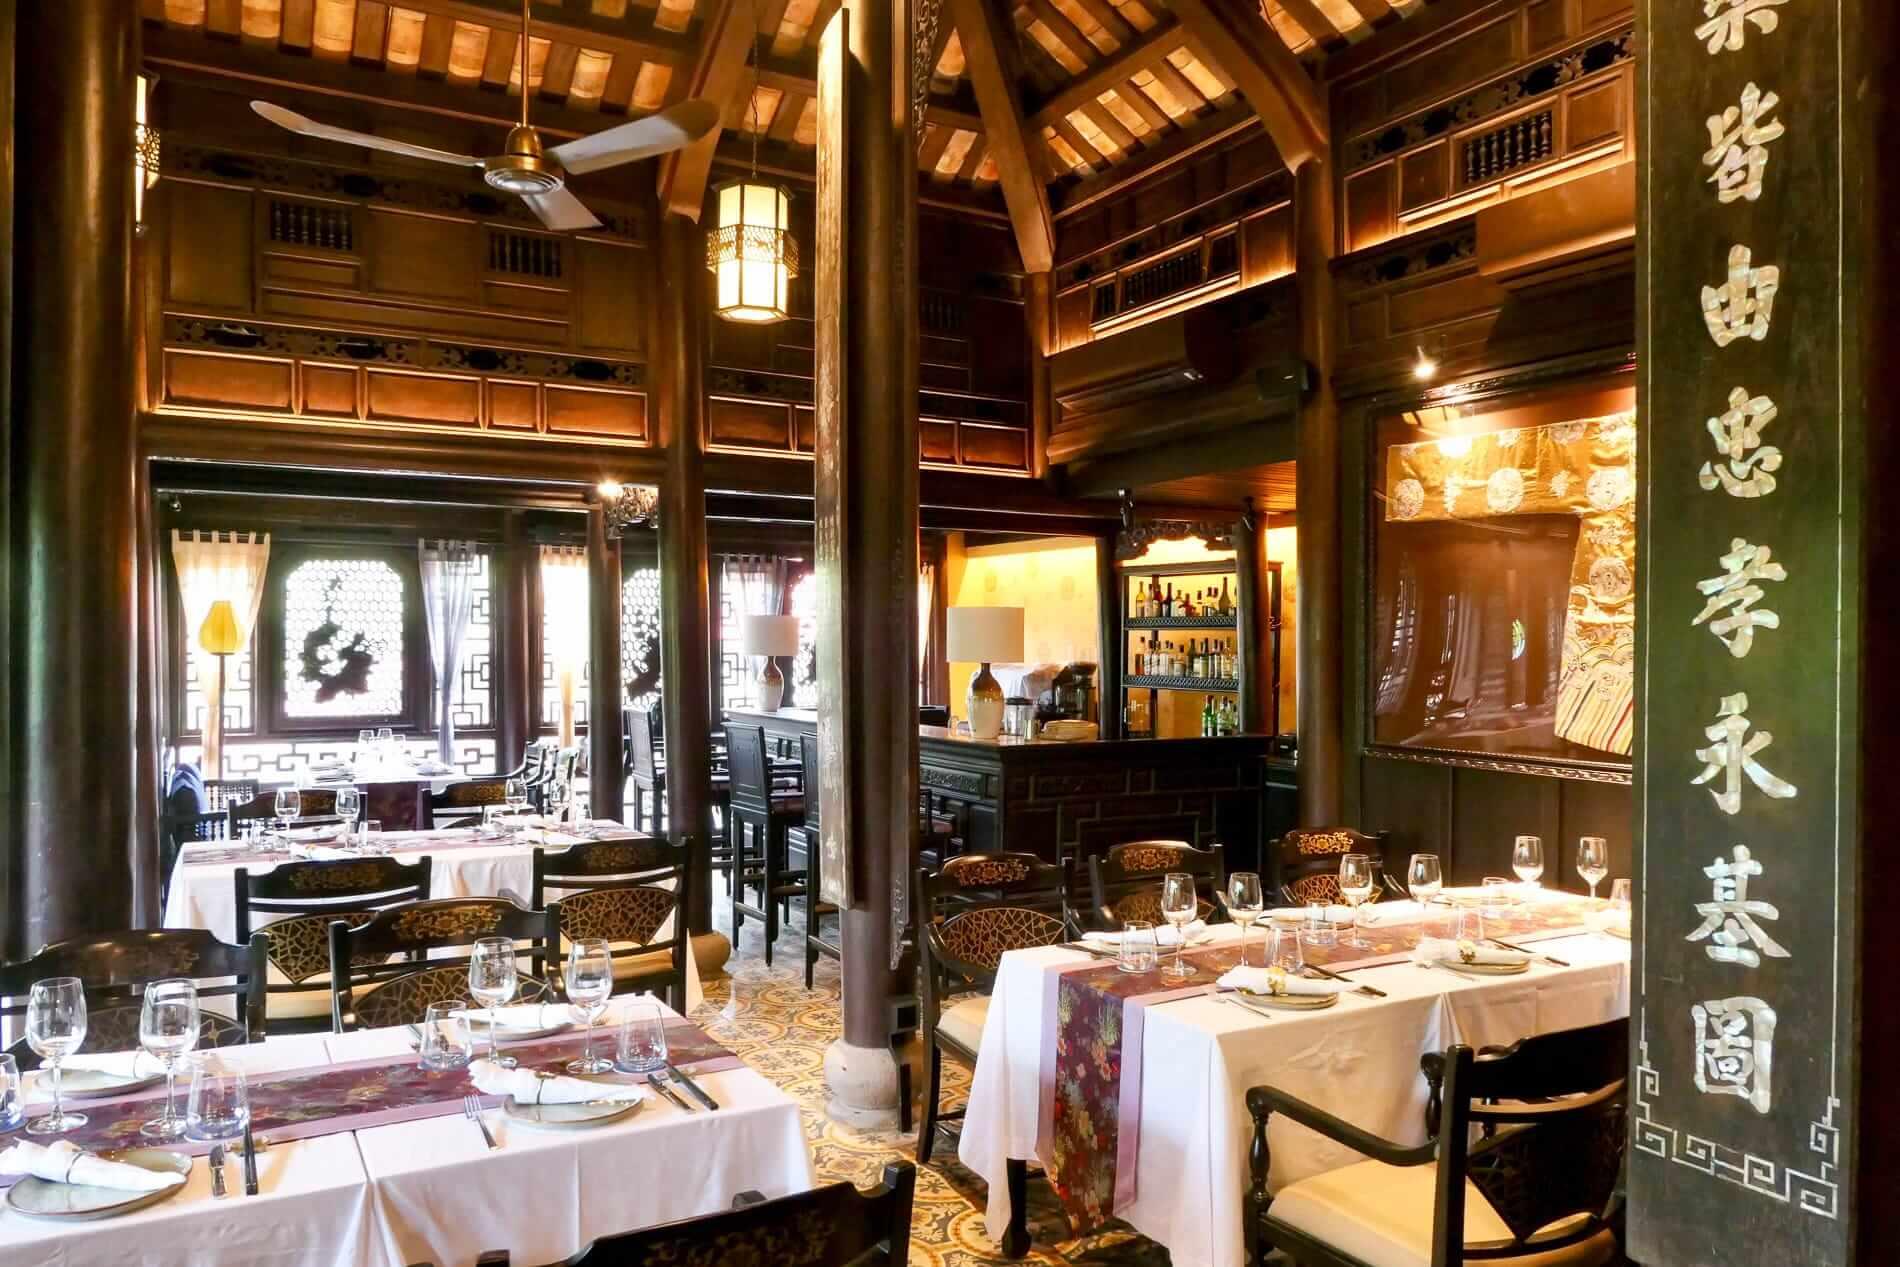 Ancient Hue Royal Gallery Restaurant